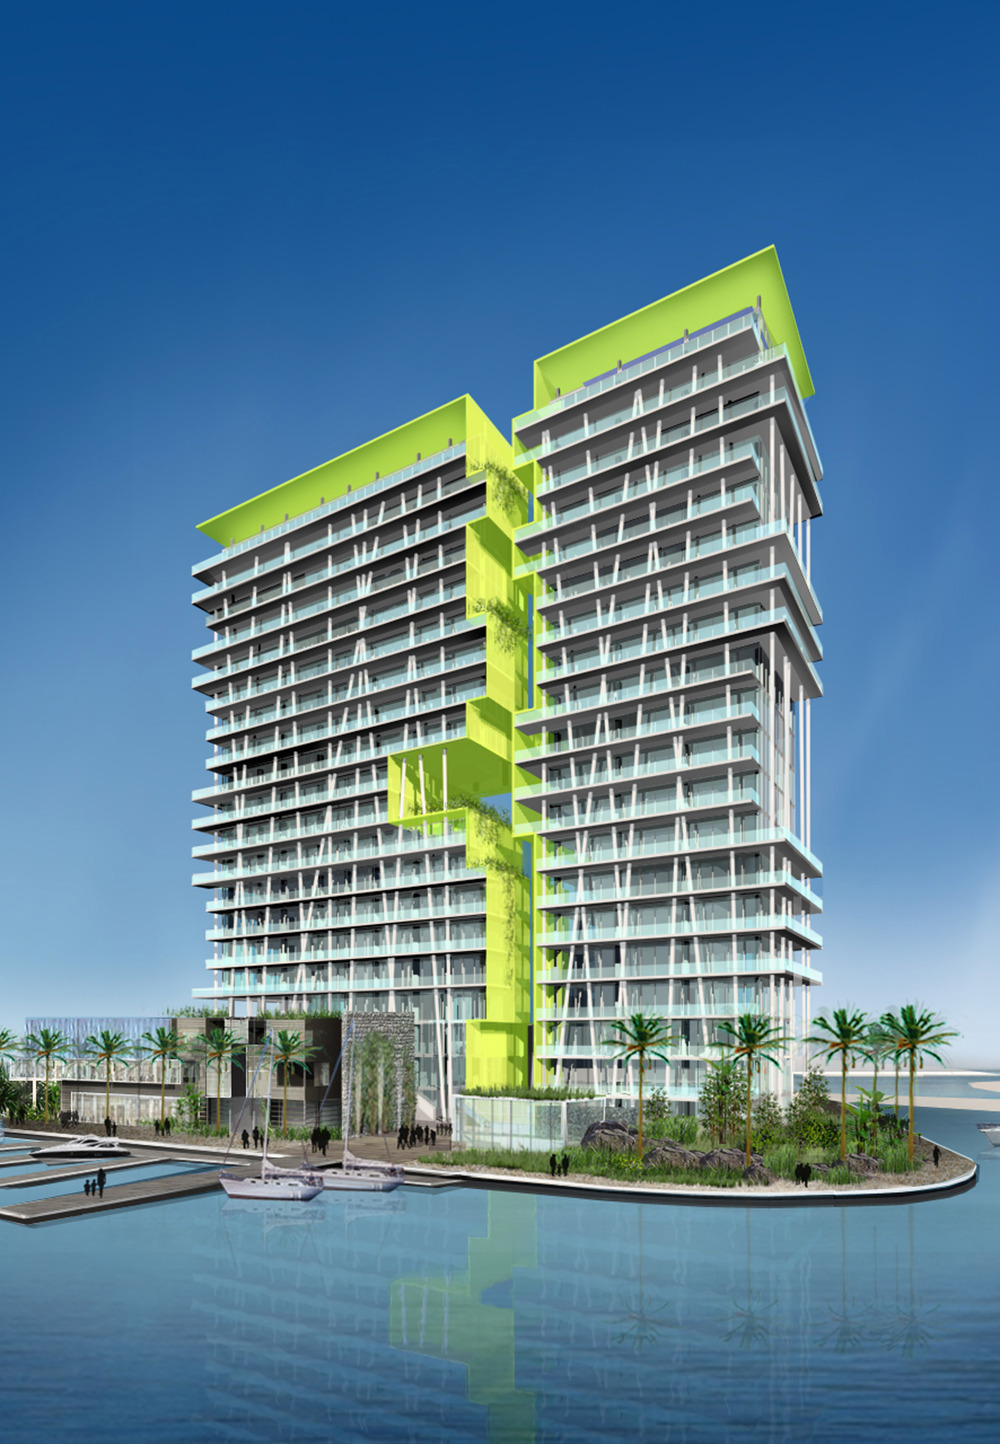 Torre Verde de Cancun